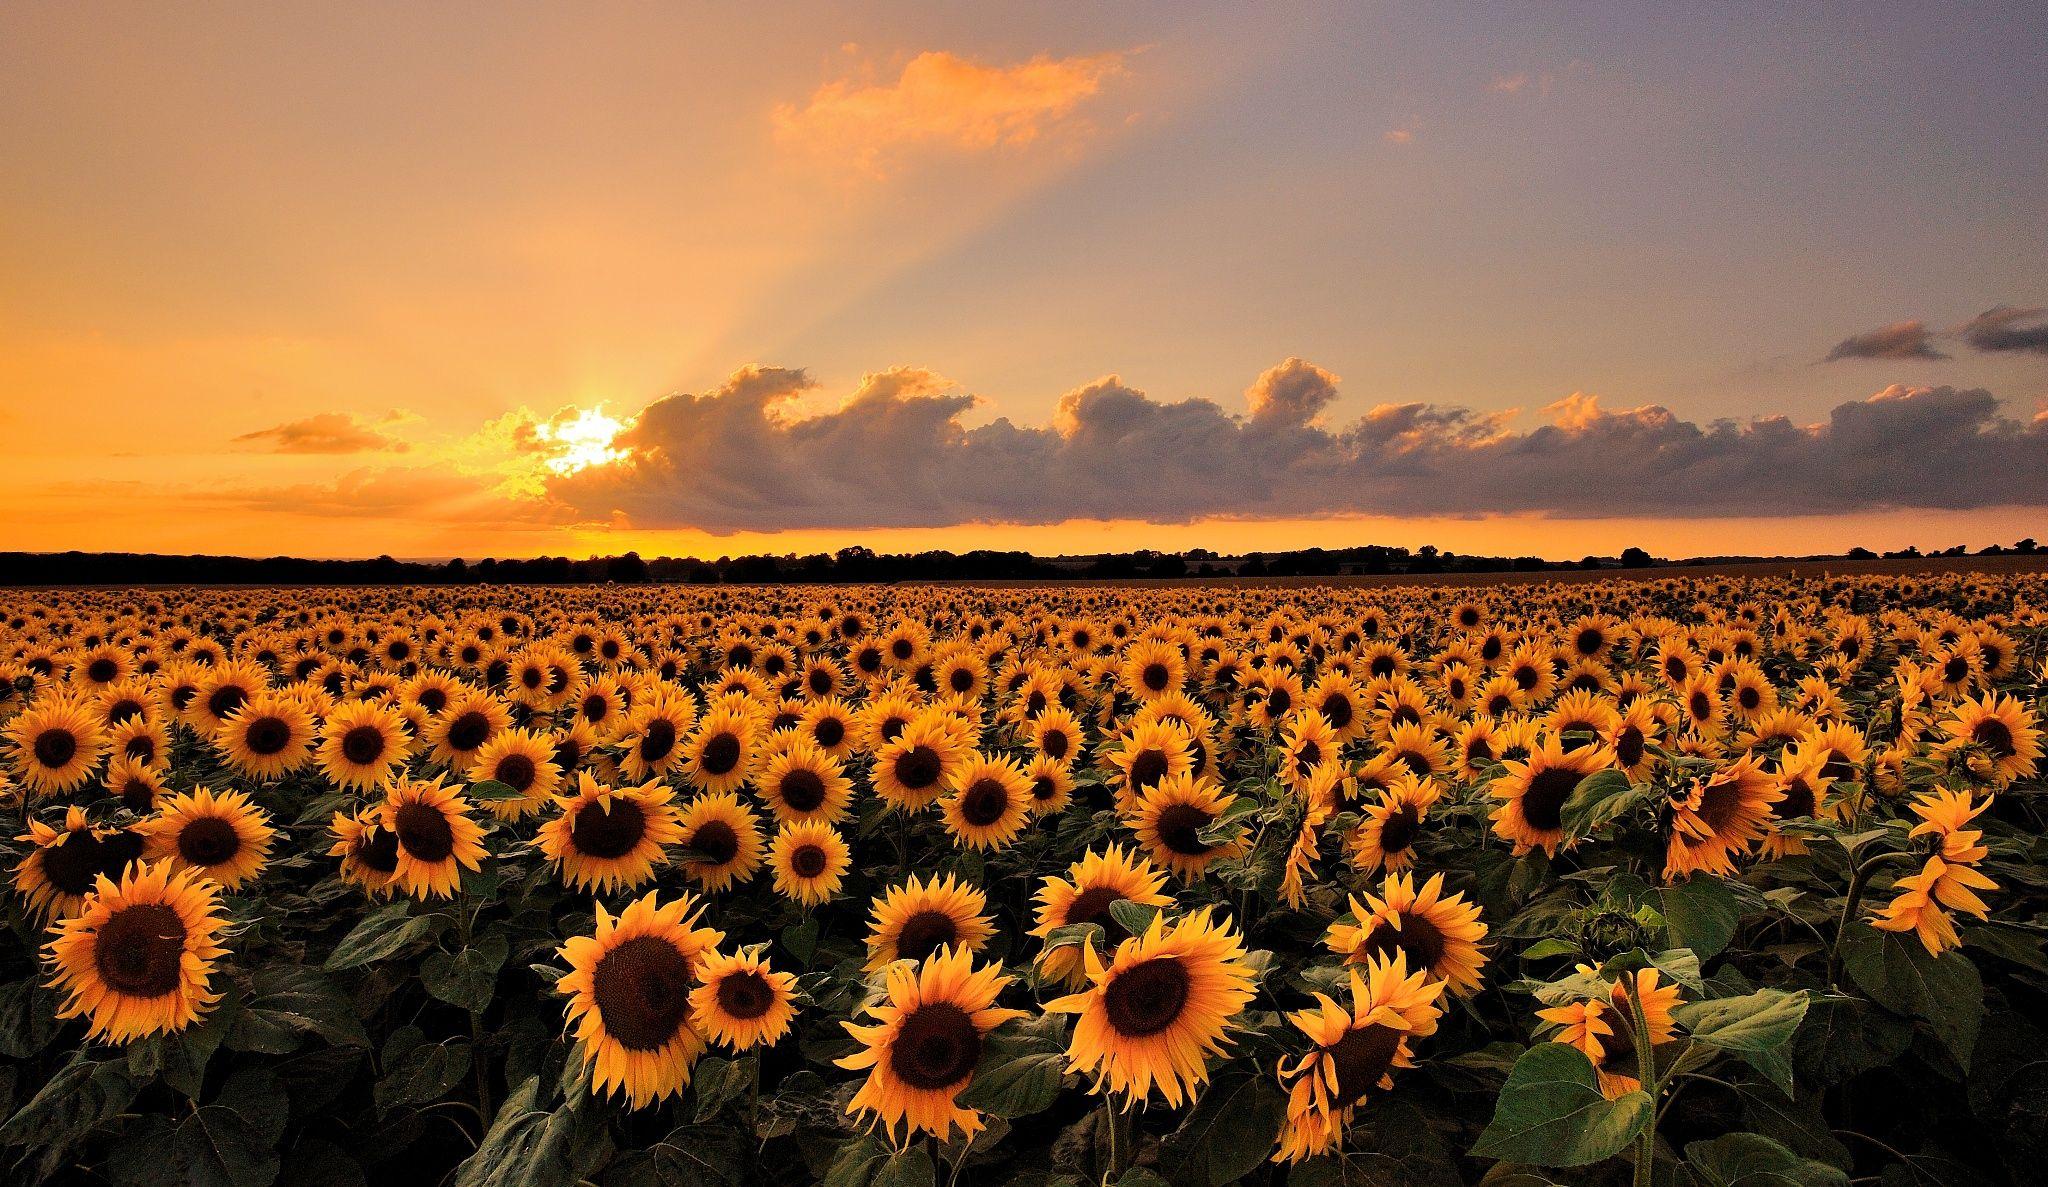 A Sunflower Sunset Sunset Landscape Sunflower Sunset Nature Photography